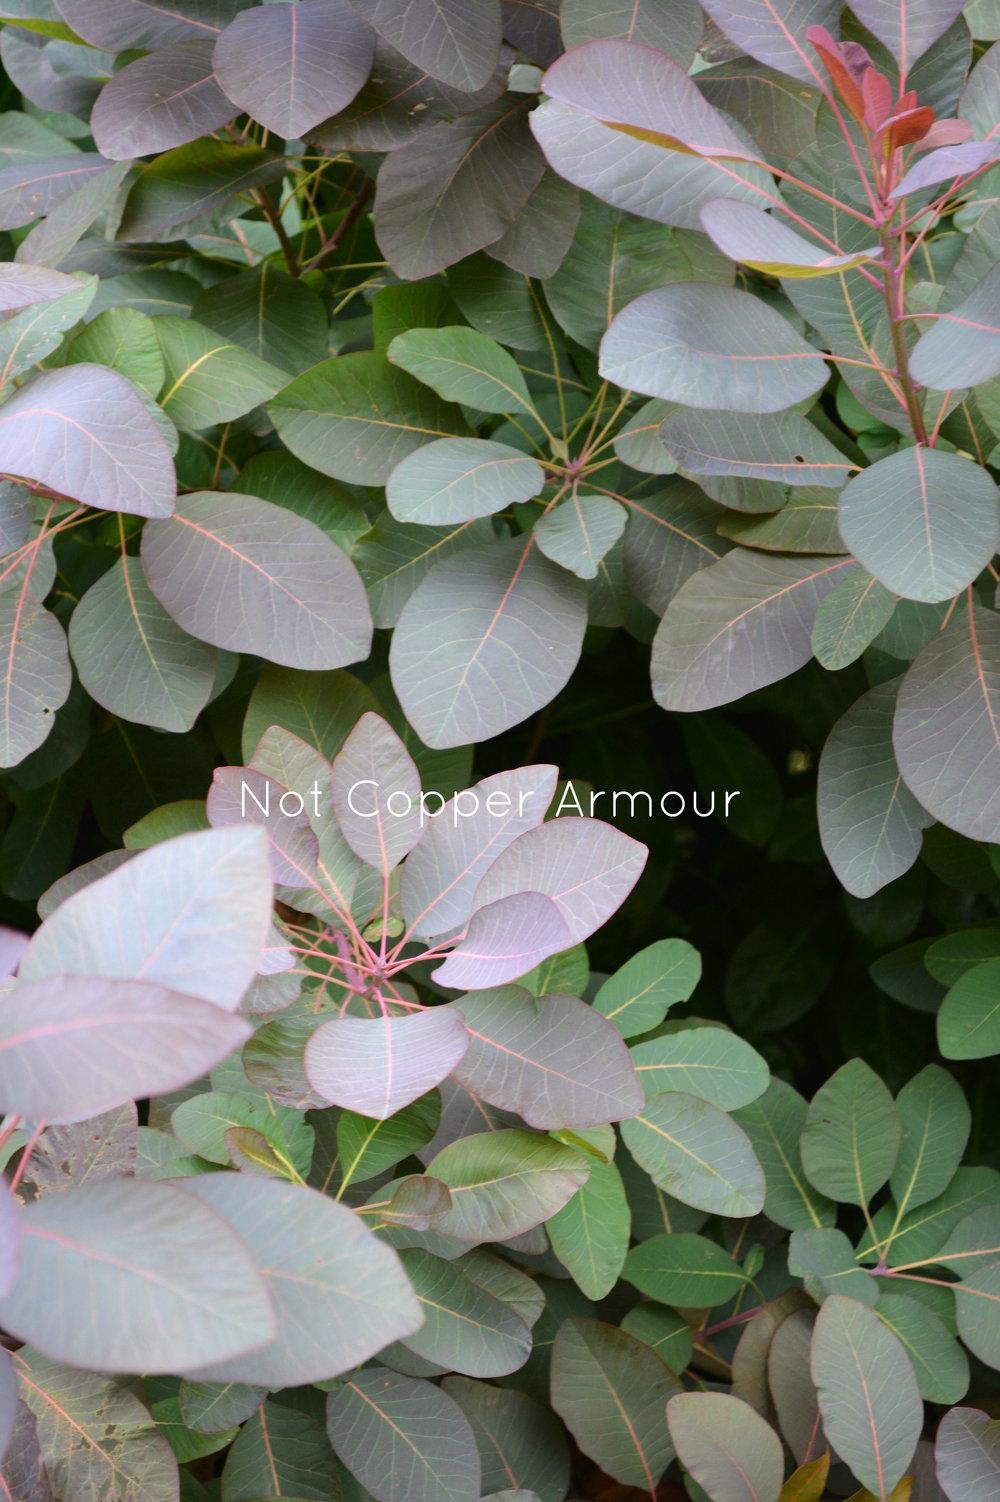 Not Copper Amour - WM #07.jpg